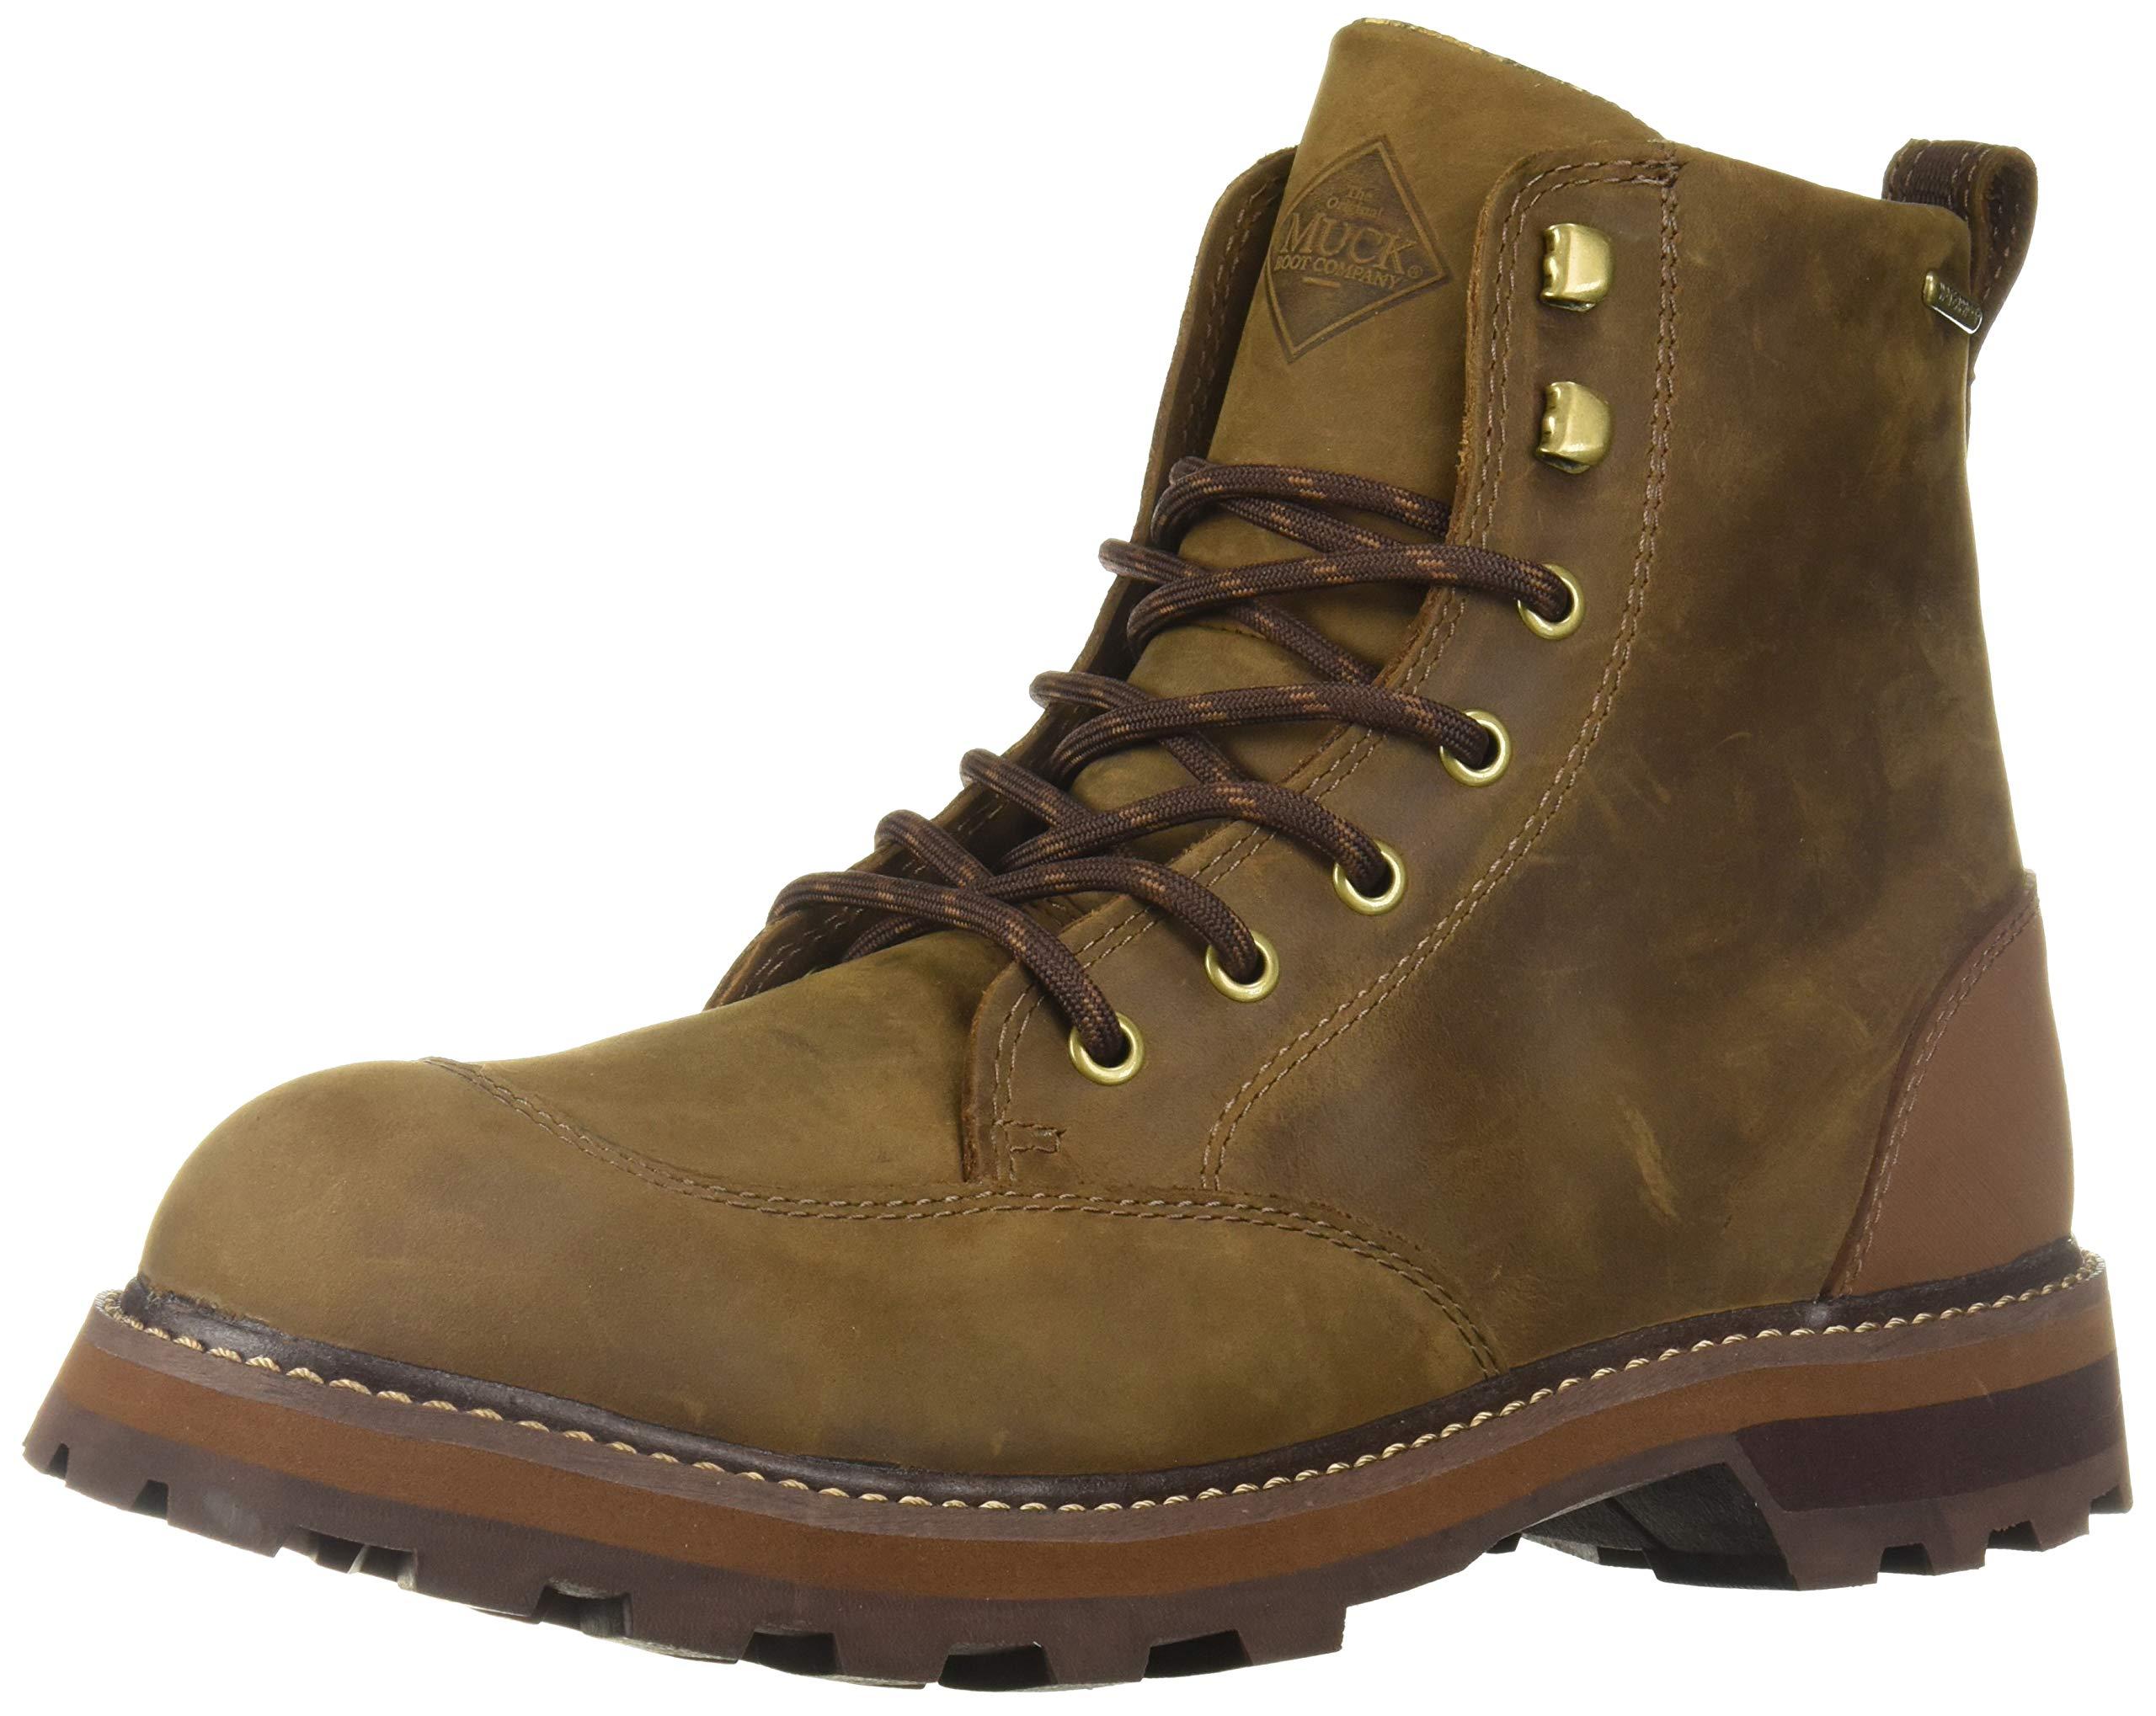 Muck Boot Men's Foreman Rain Boot Brown 8.5 Regular US by Muck Boot